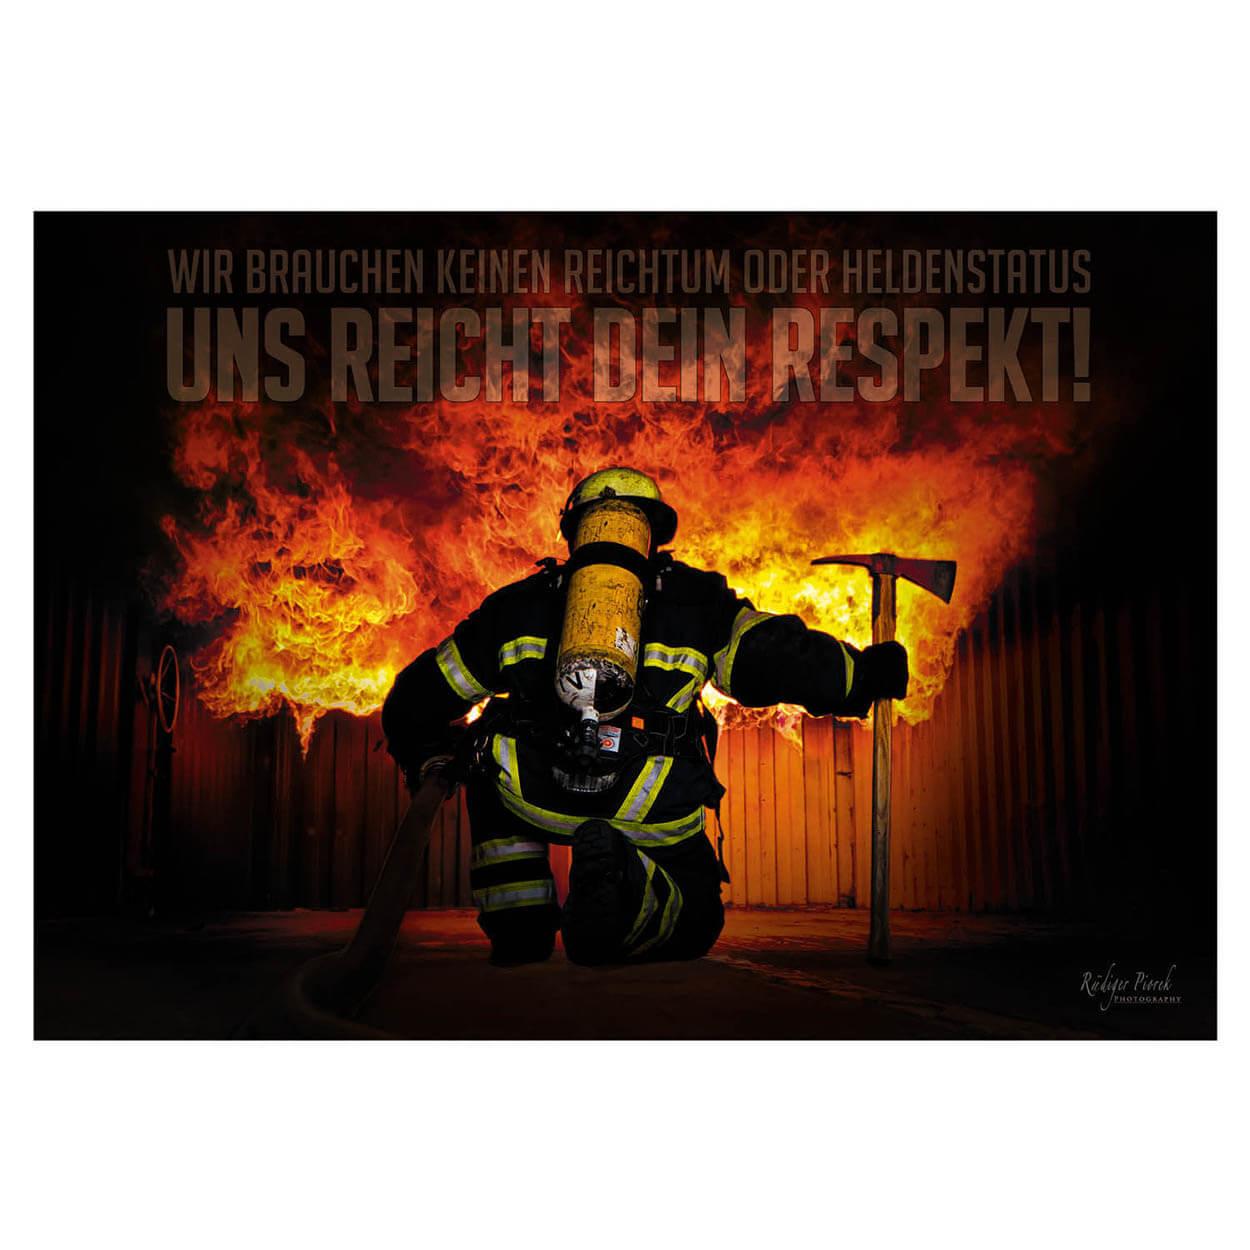 Feuerwehrposter Dein Respekt - Wandbild 100 x 70 cm